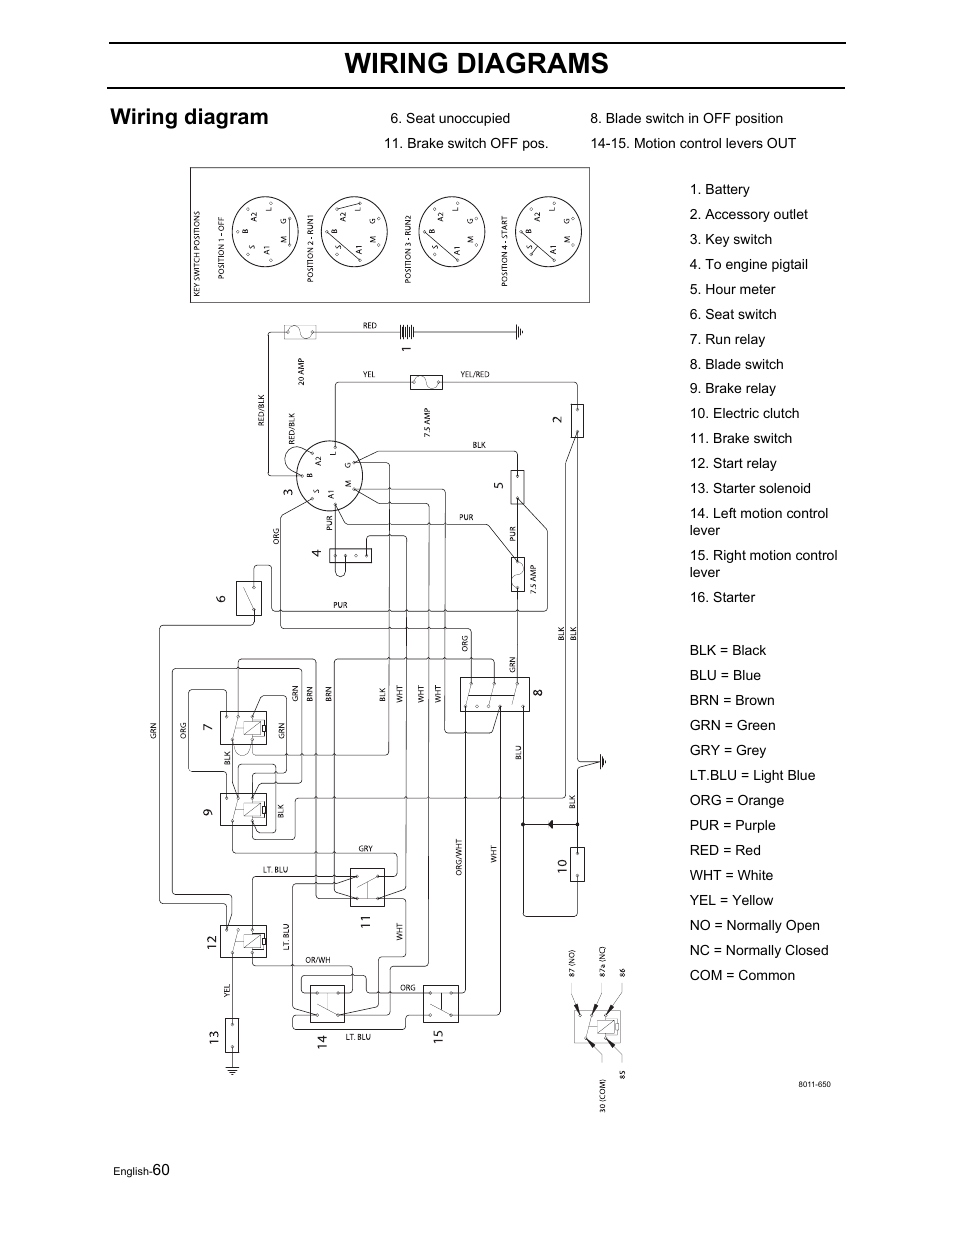 Poulan Pro 42 Wiring Diagram Detailed Schematics Lawn Mower Diagrams U2022 Ignition Switch